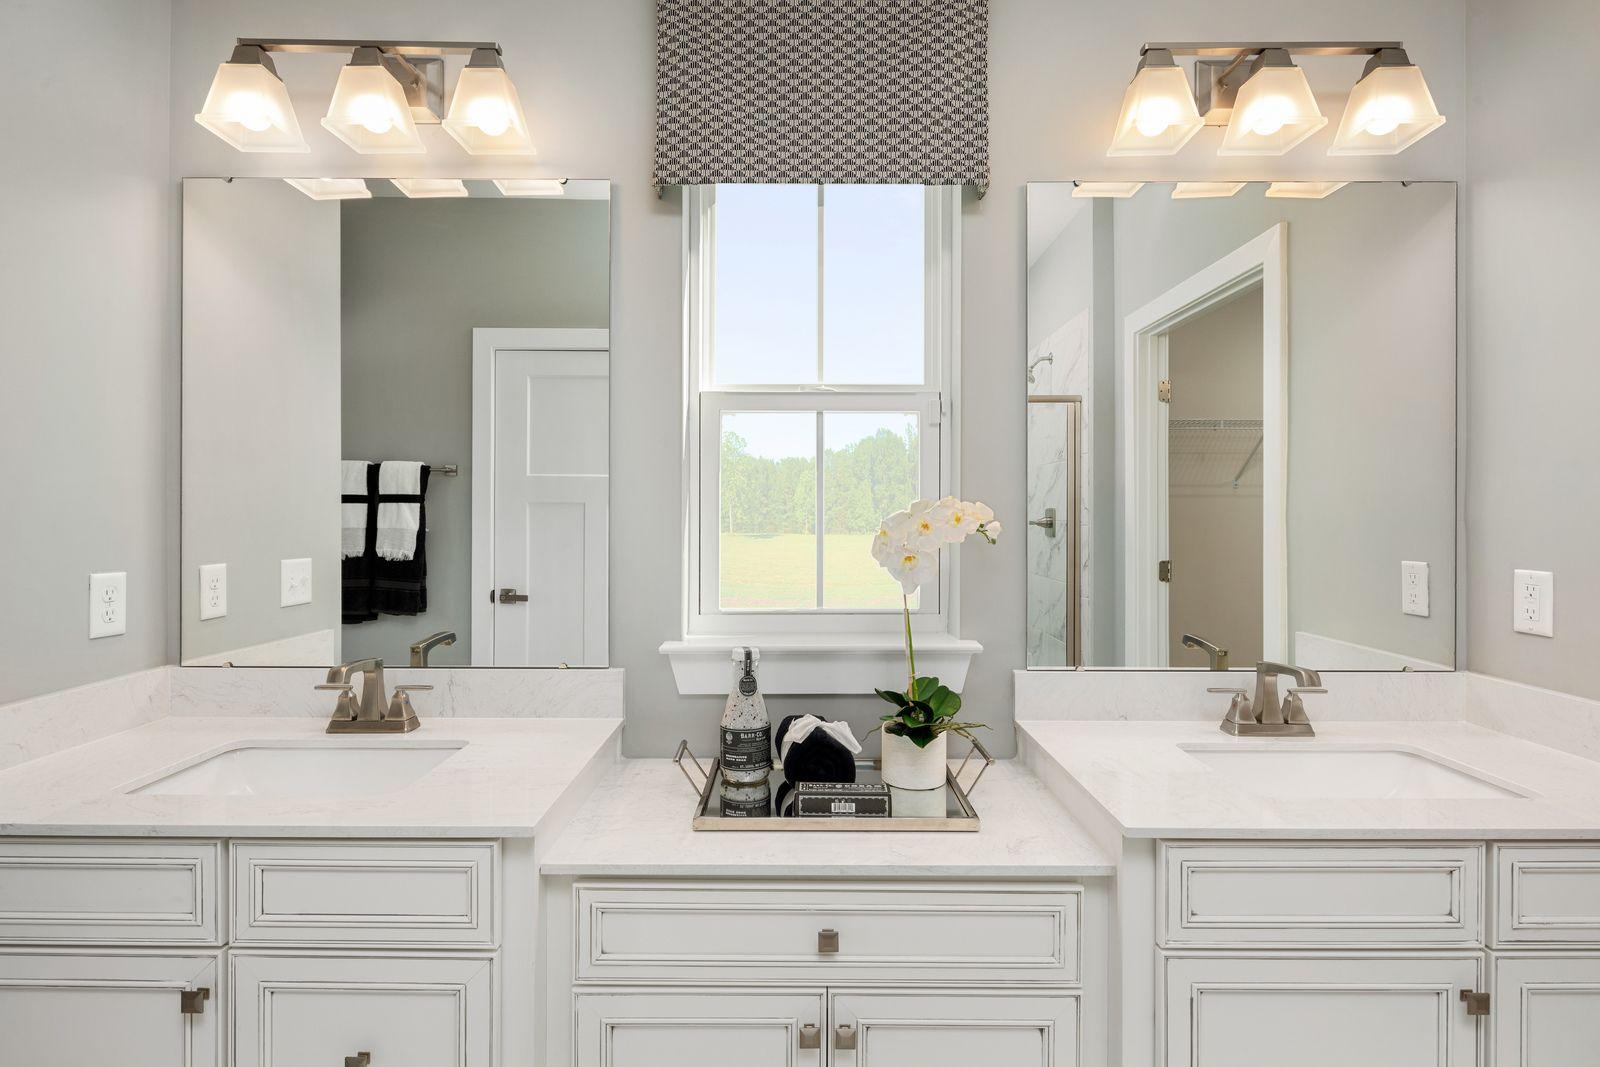 Bathroom featured in the Savannah By Ryan Homes in Sussex, DE